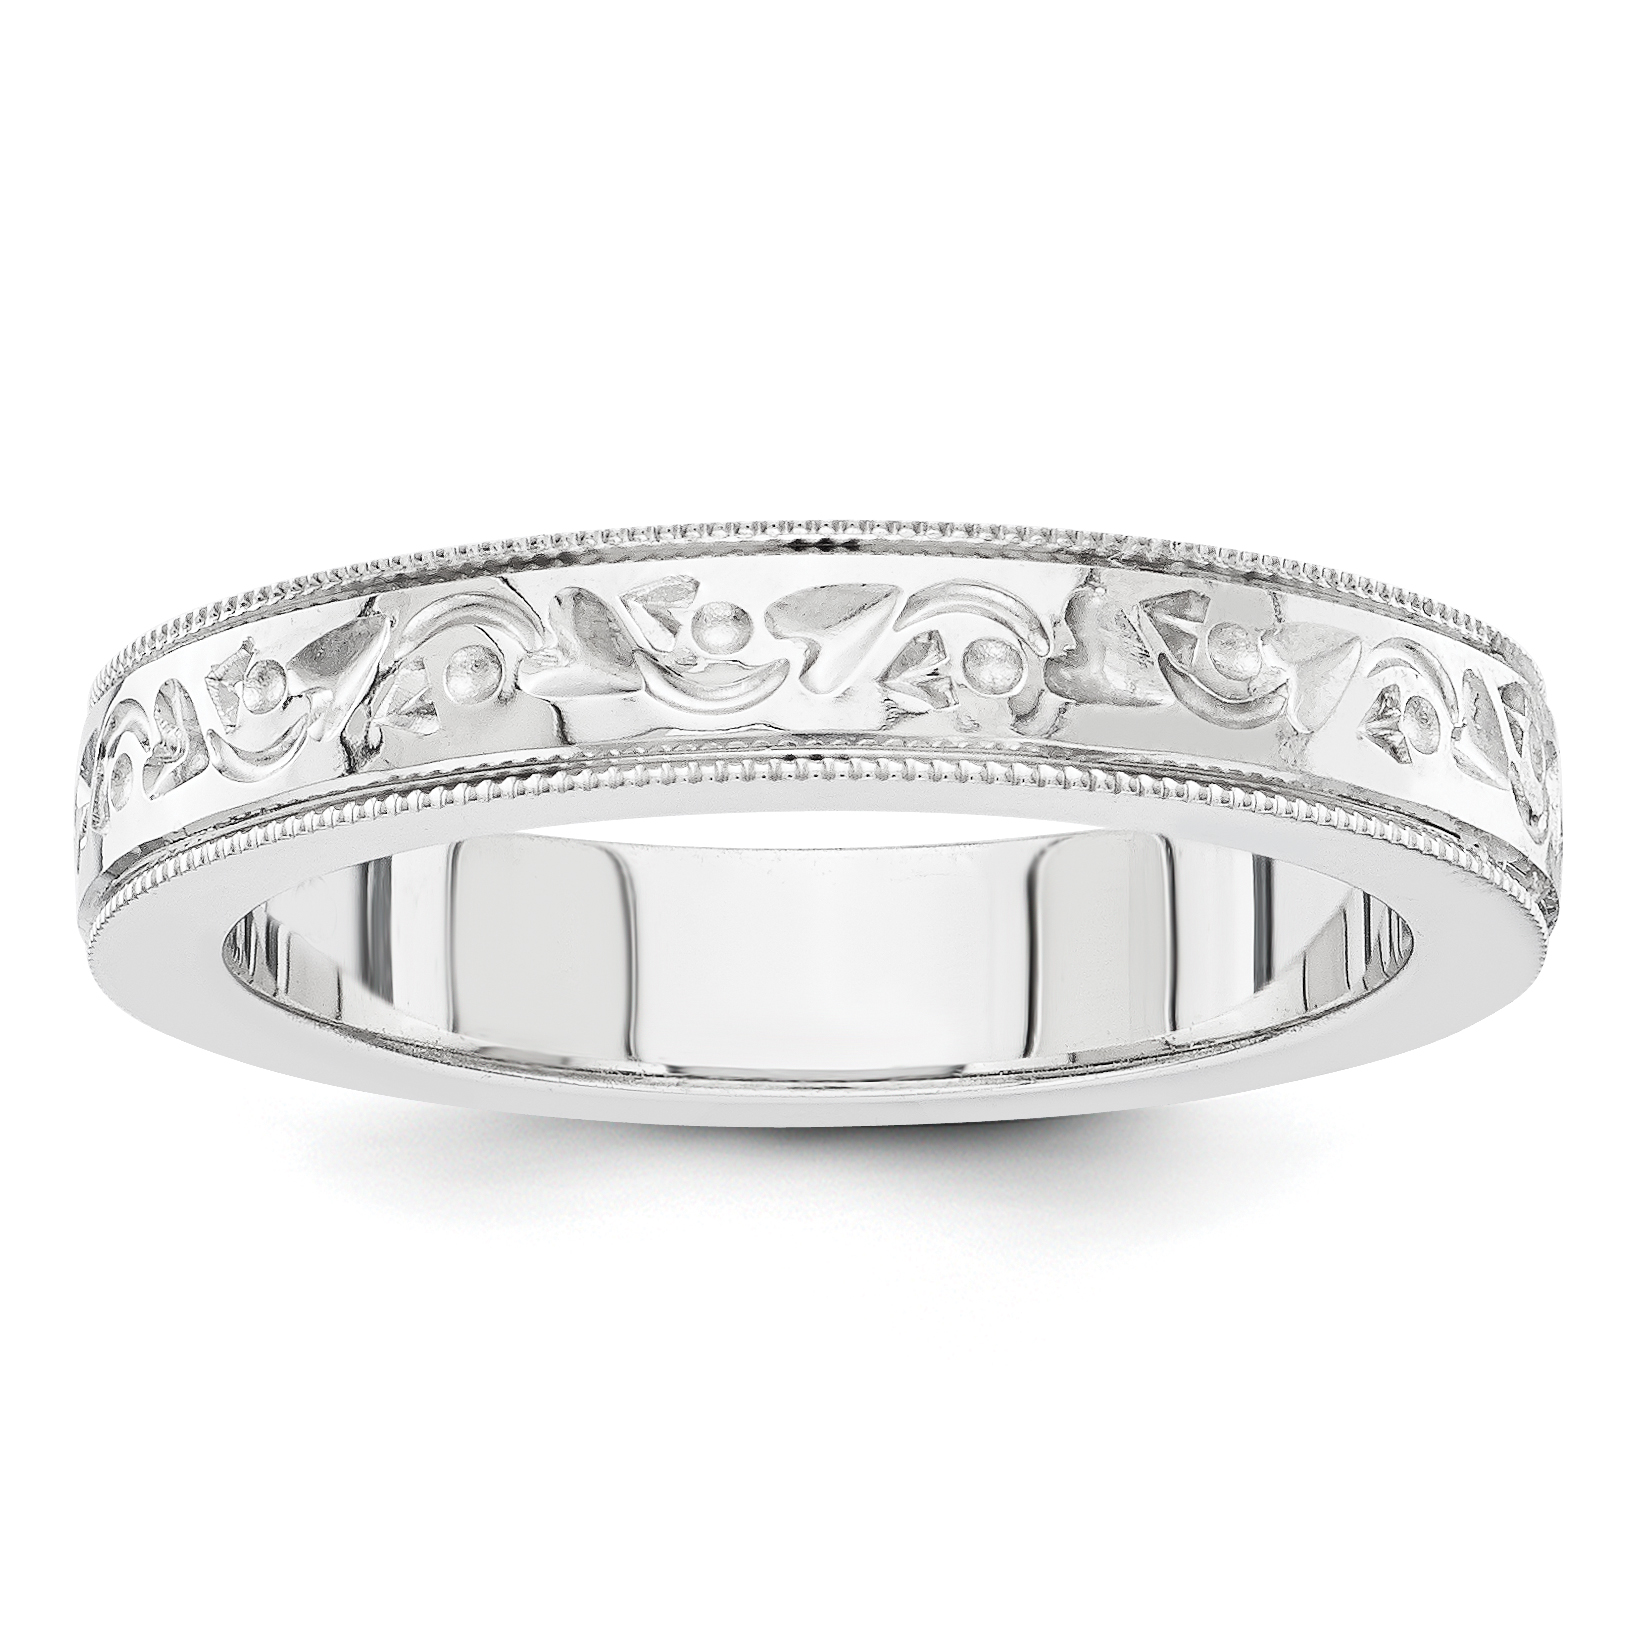 Click Thumbnails To Enlarge: White Gold Engraved Wedding Bands At Websimilar.org